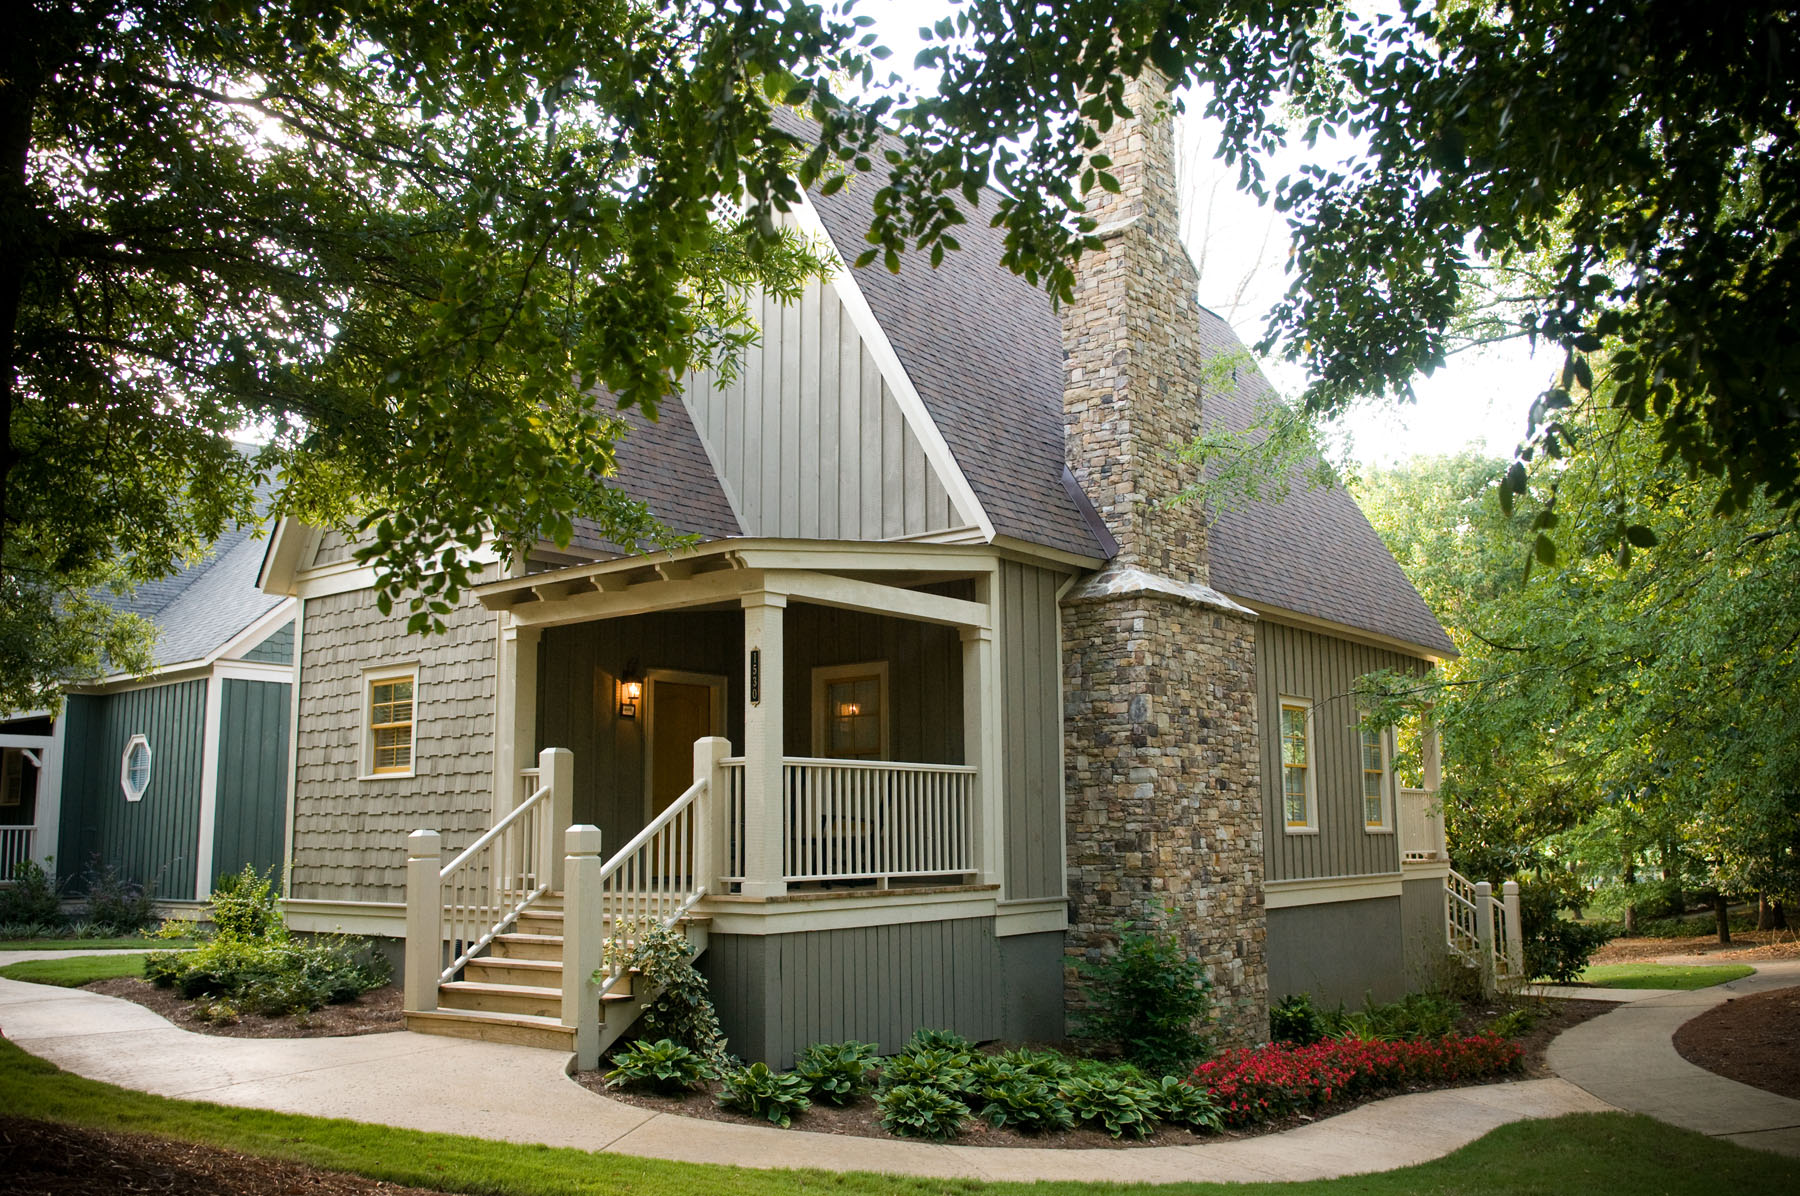 Mandarin Oriental Atlanta And Barnsley Gardens Resort Announce Town Country Package